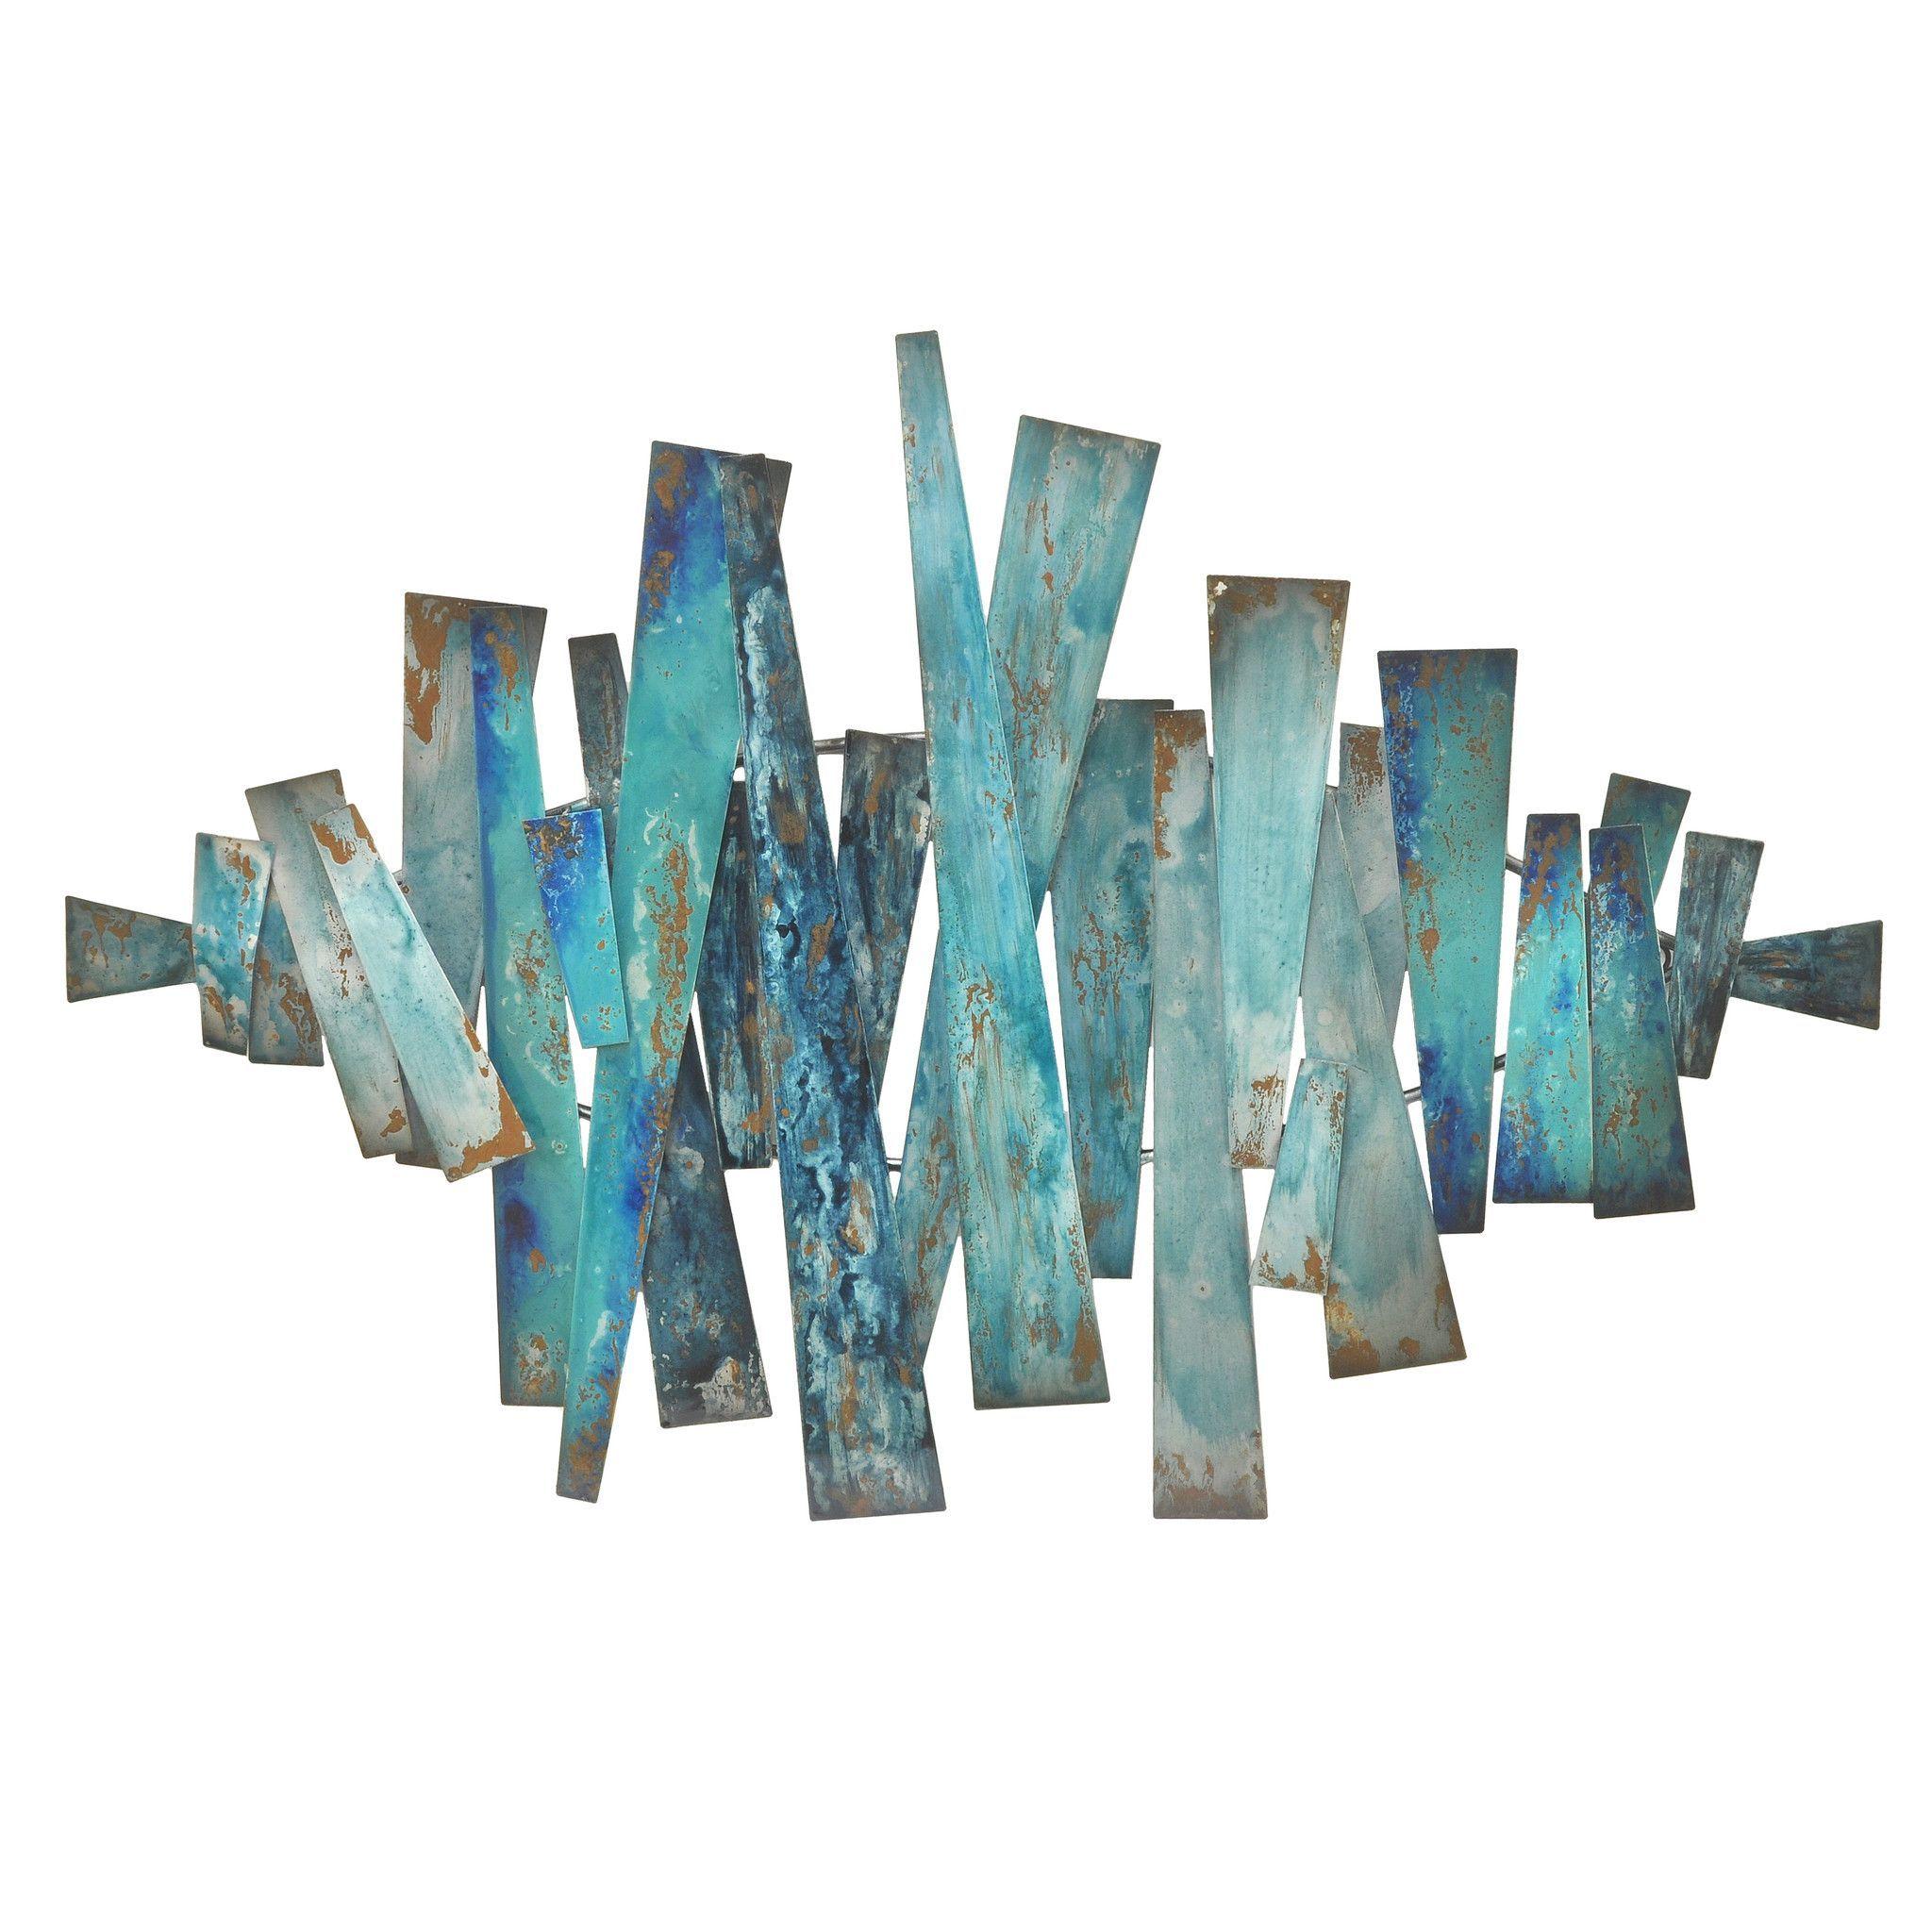 Three hands abstract metal slats wall decor blues slat wall